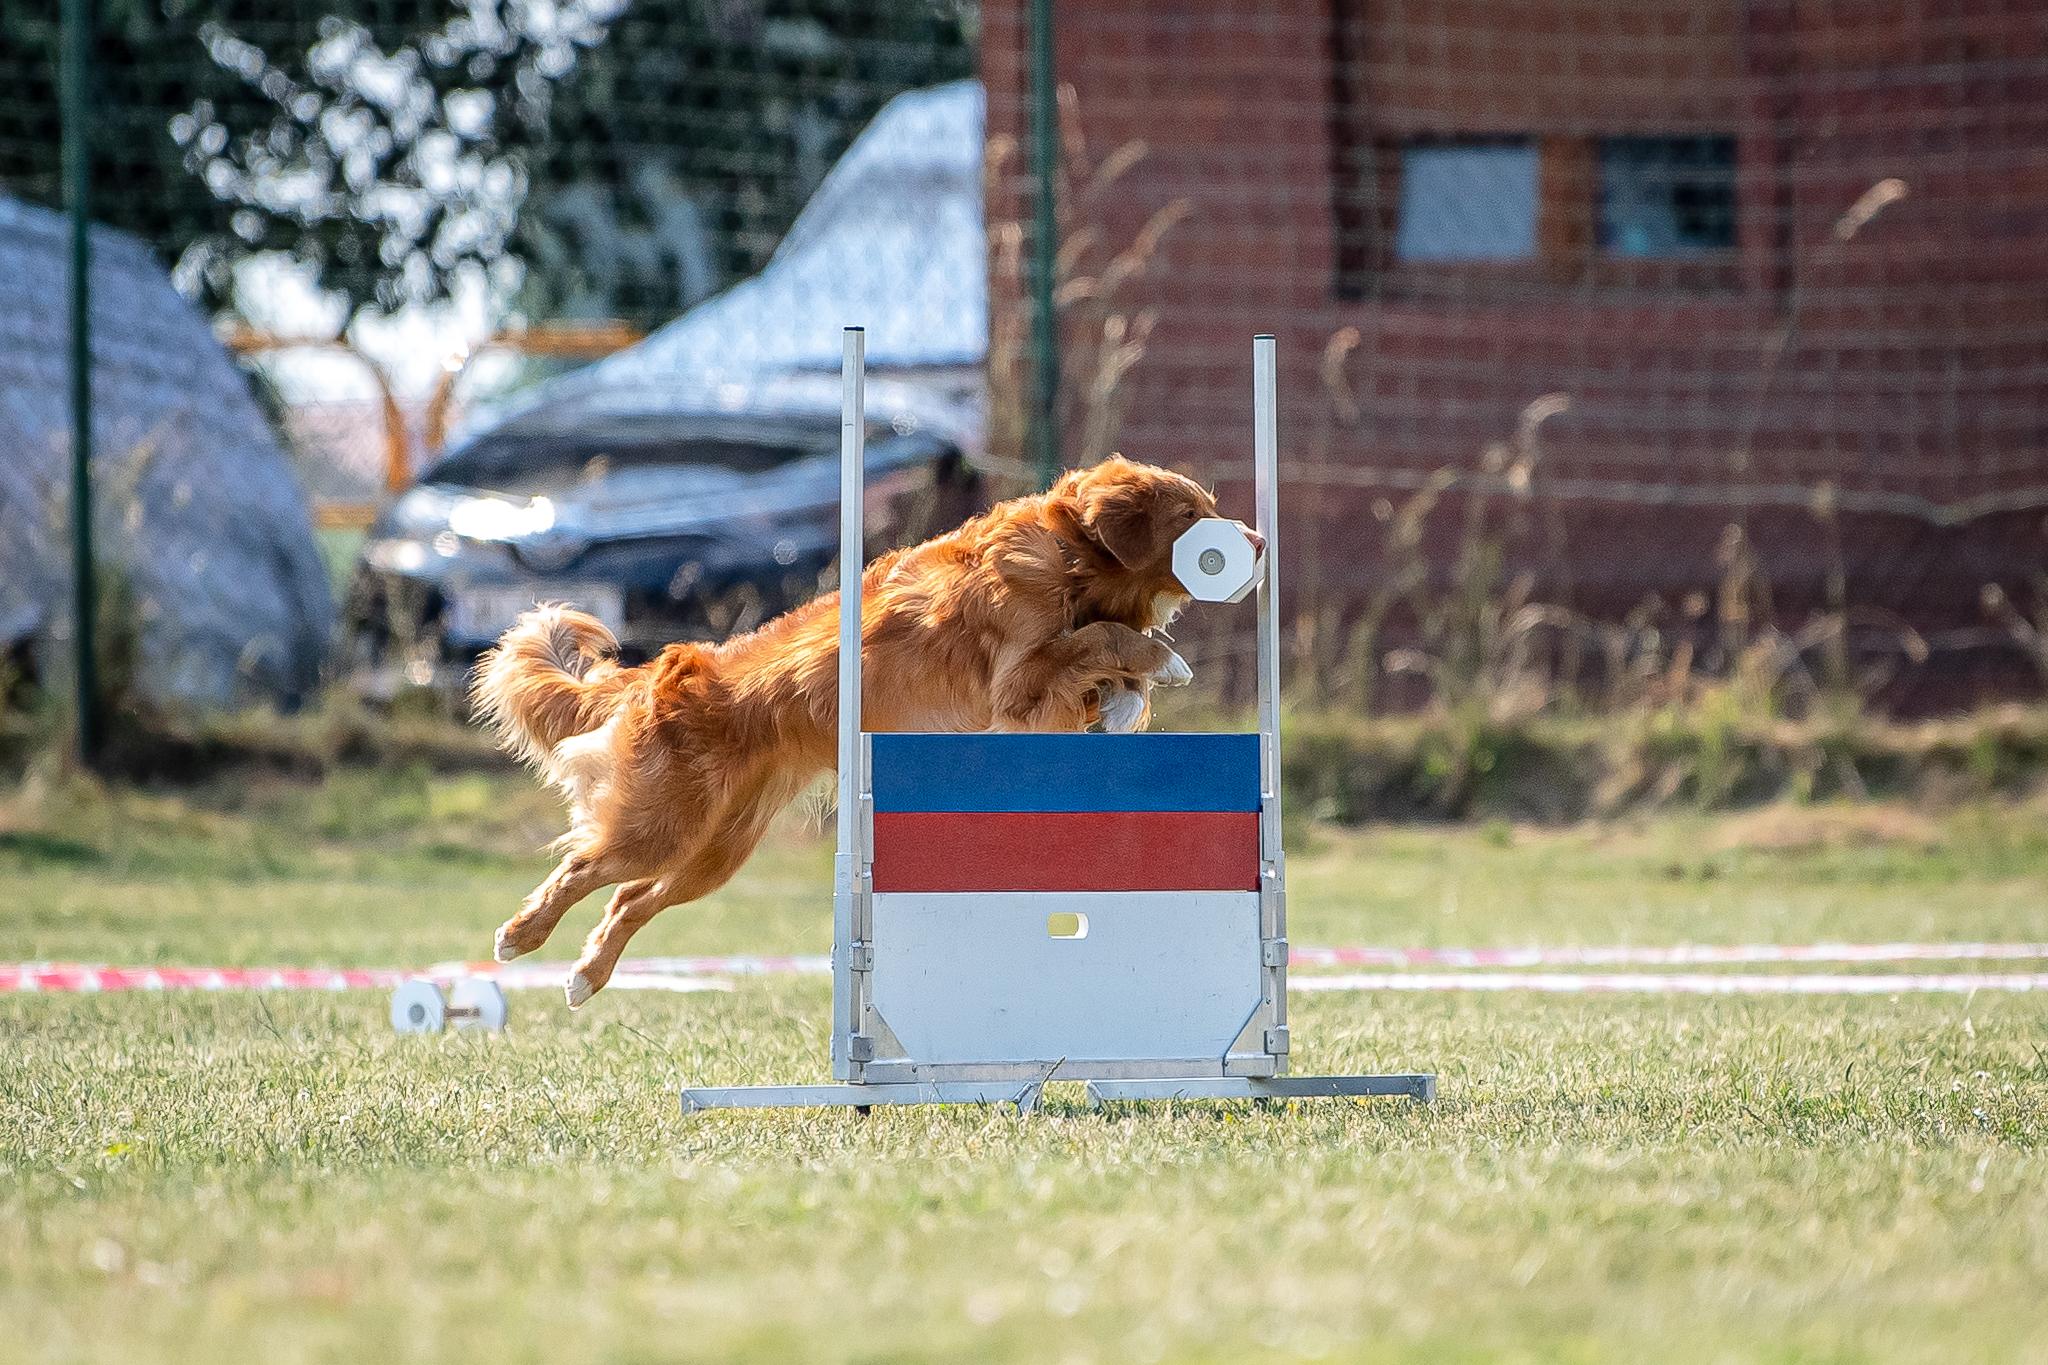 Nova Scotia Duck Tolling Retriever obedience competition